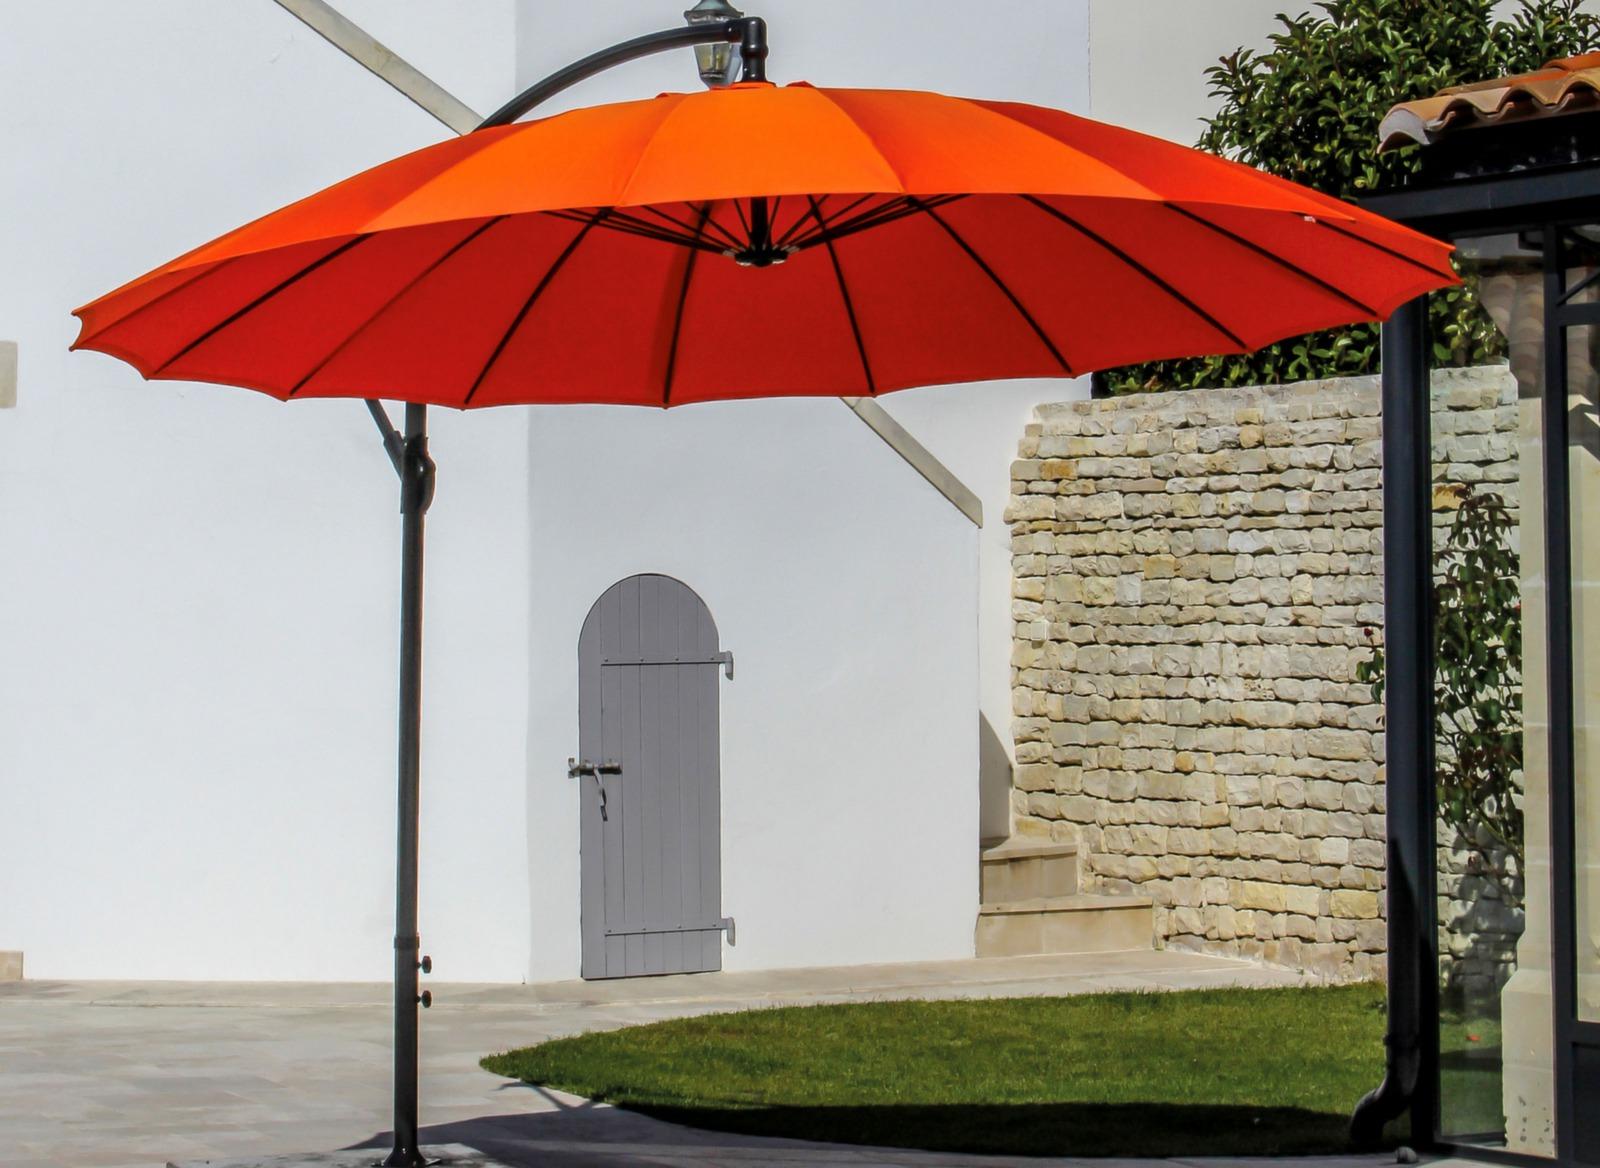 Parasol dport orange rond Pagode 3m  Proloisirs